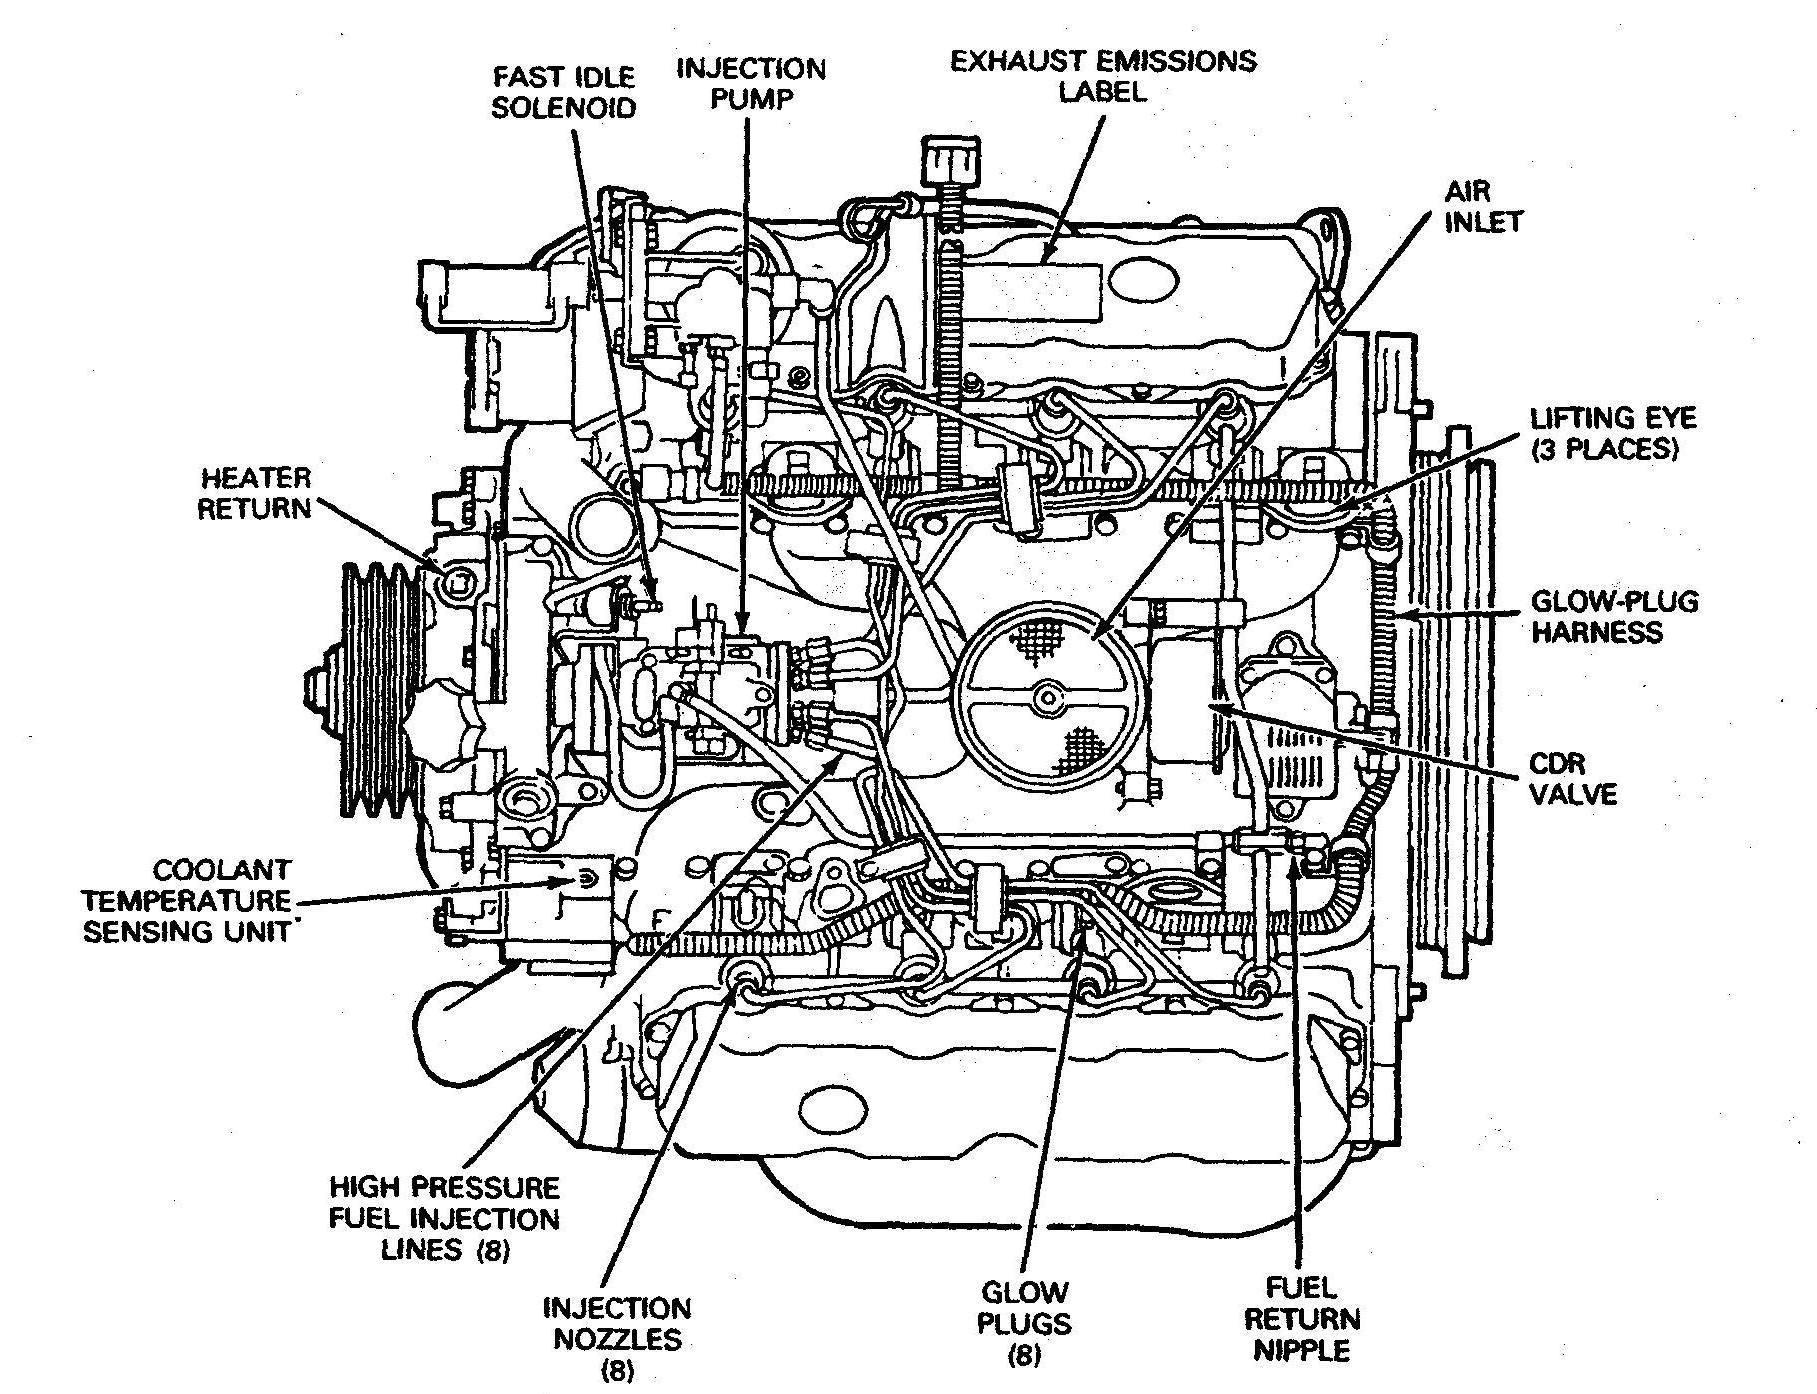 [DIAGRAM_38IU]  ZA_5516] Mazda Rotary Engine Diagram Schematic Wiring | Mazda Emission Wiring Harness 2001 |  | Odga Unbe Gresi Skat Salv Mohammedshrine Librar Wiring 101